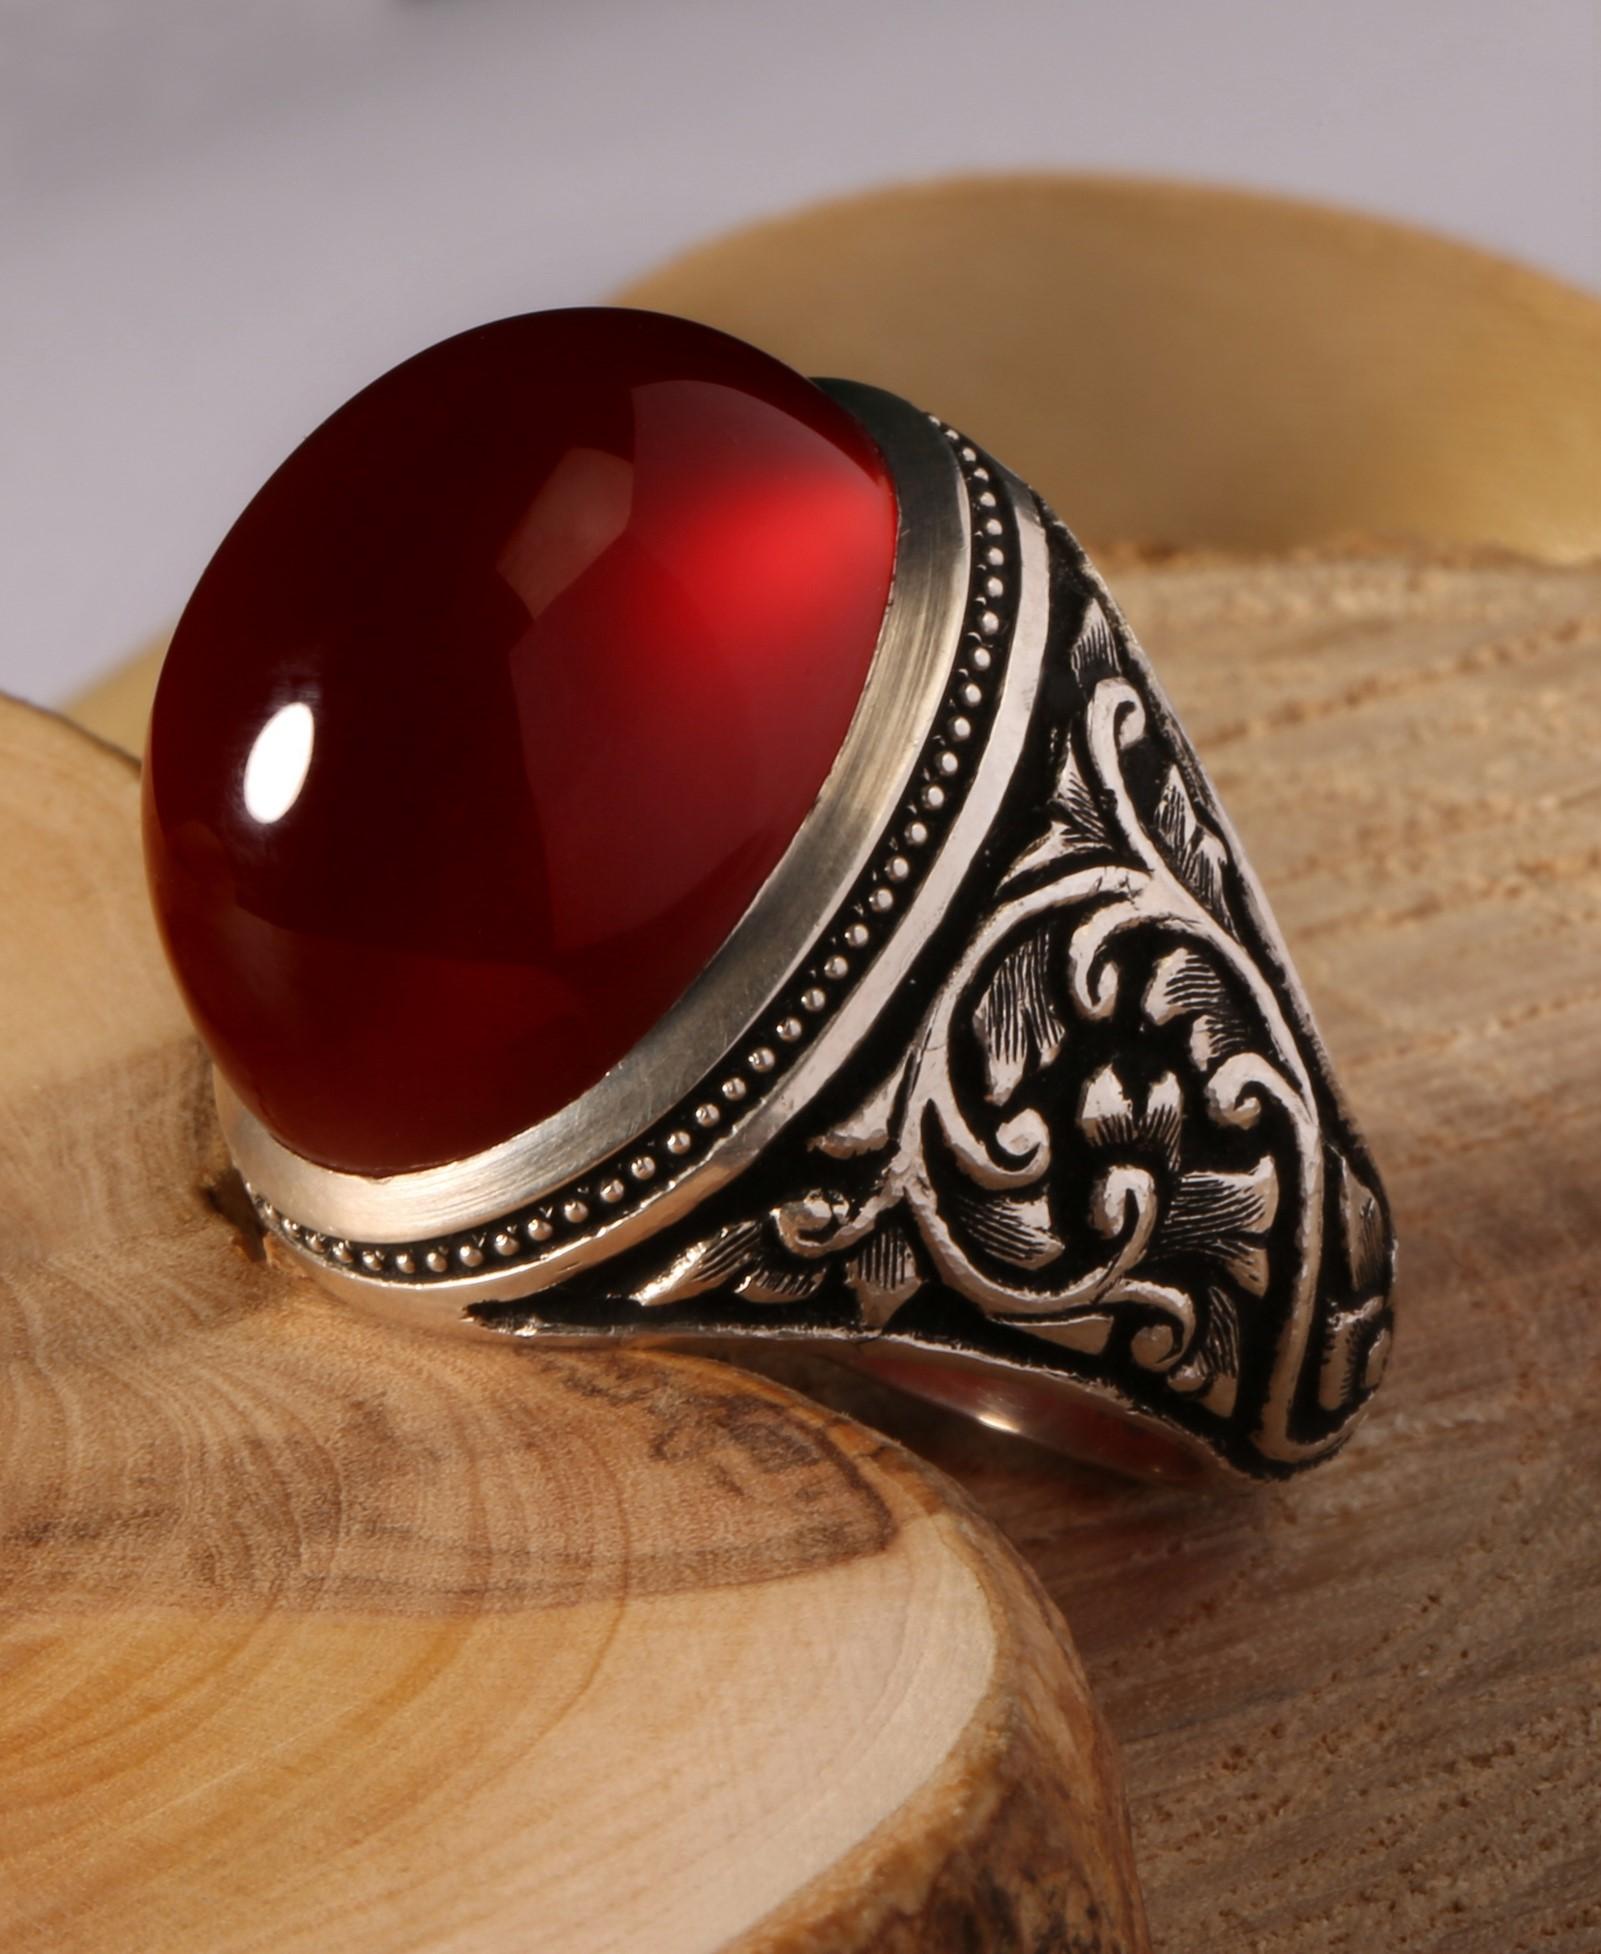 A-1461 انگشتر عقیق سرخ طبیعی با پایه دست ساز نقره و قلم زنی حرفه ای